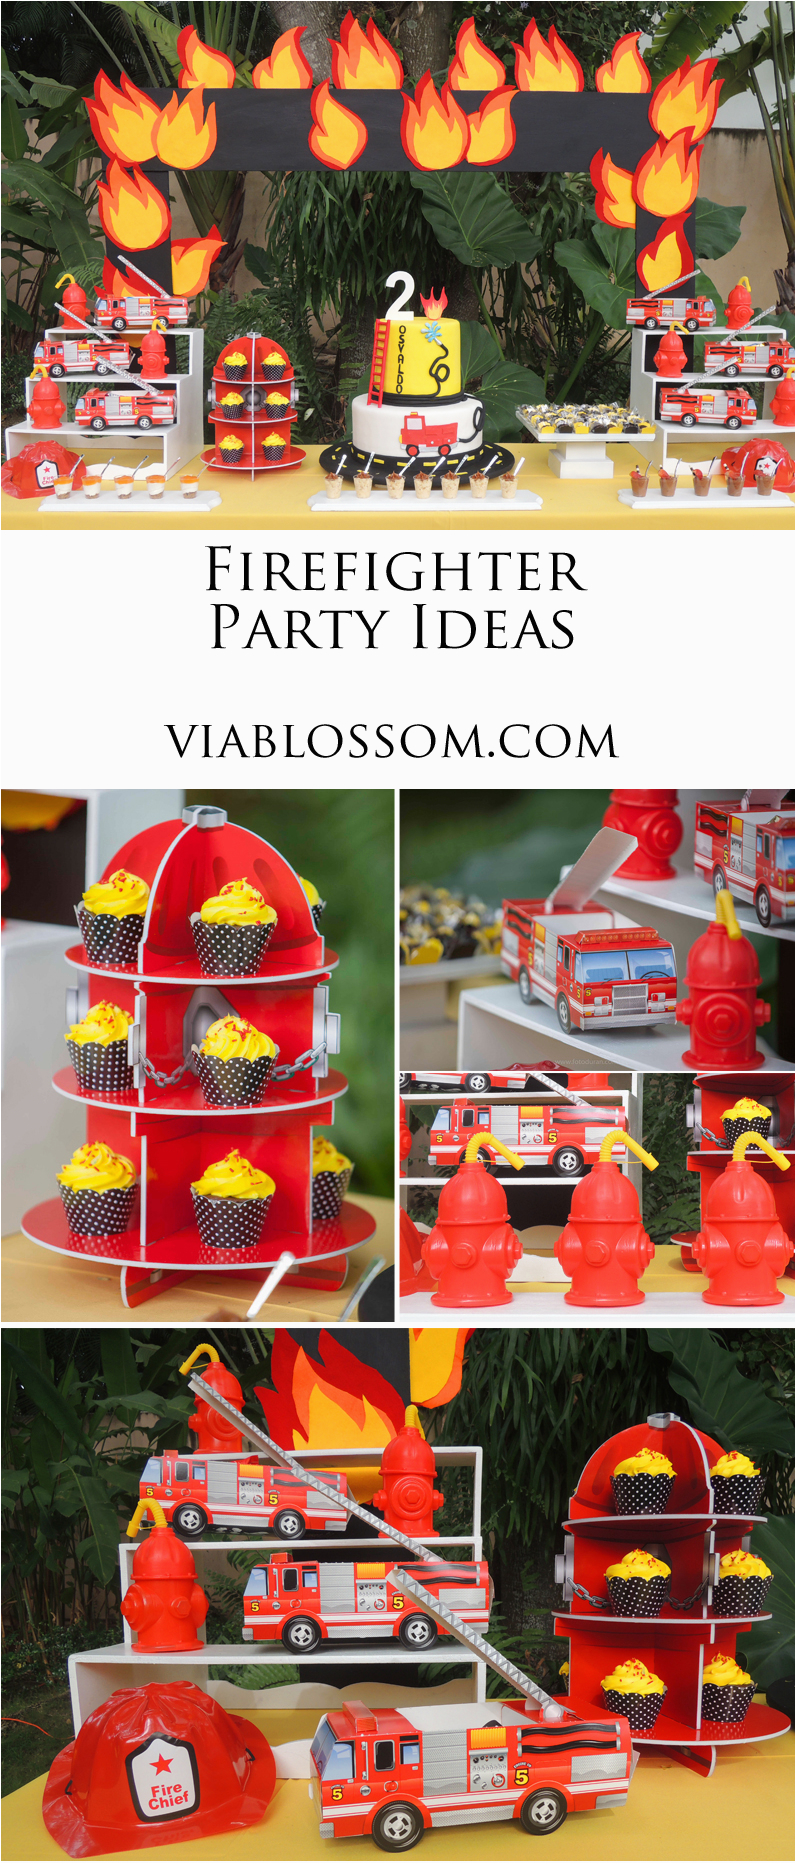 Firefighter Birthday Decorations Firefighter Birthday Party Via Blossom